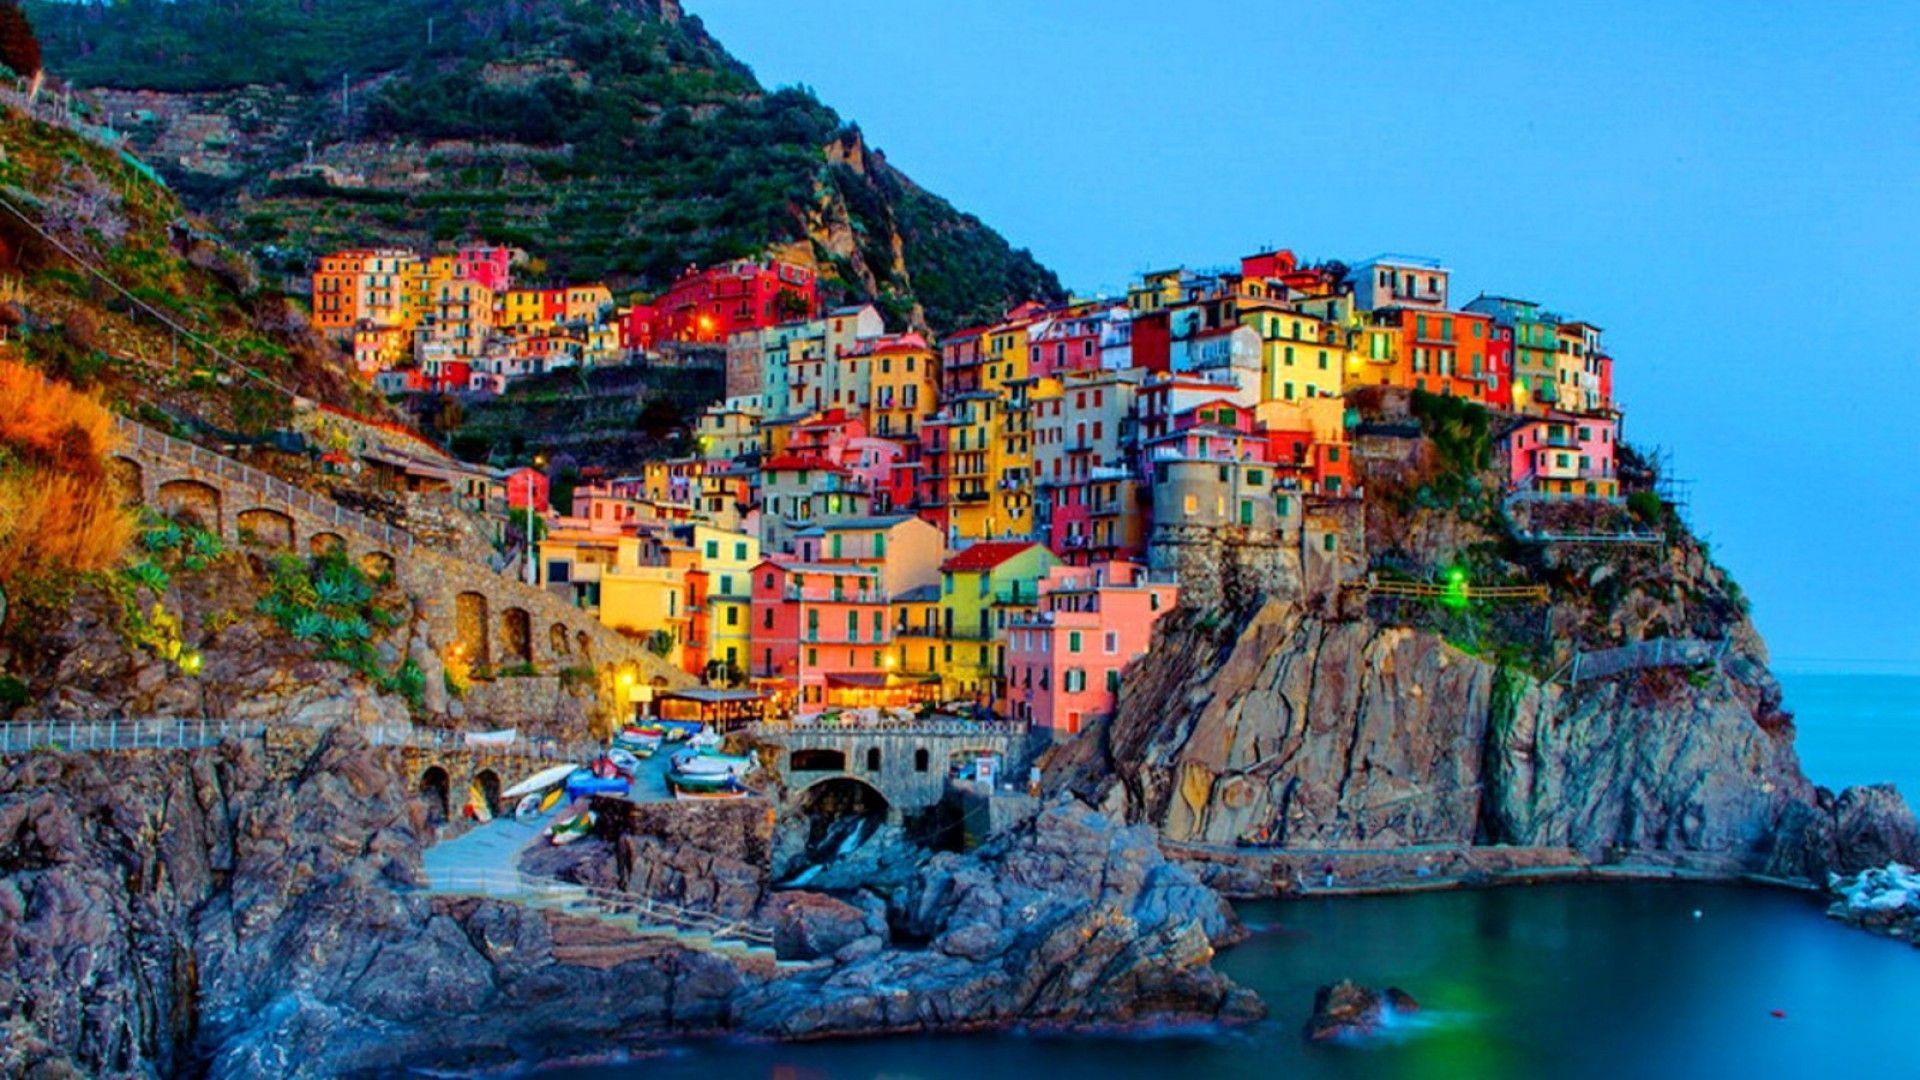 Italy image